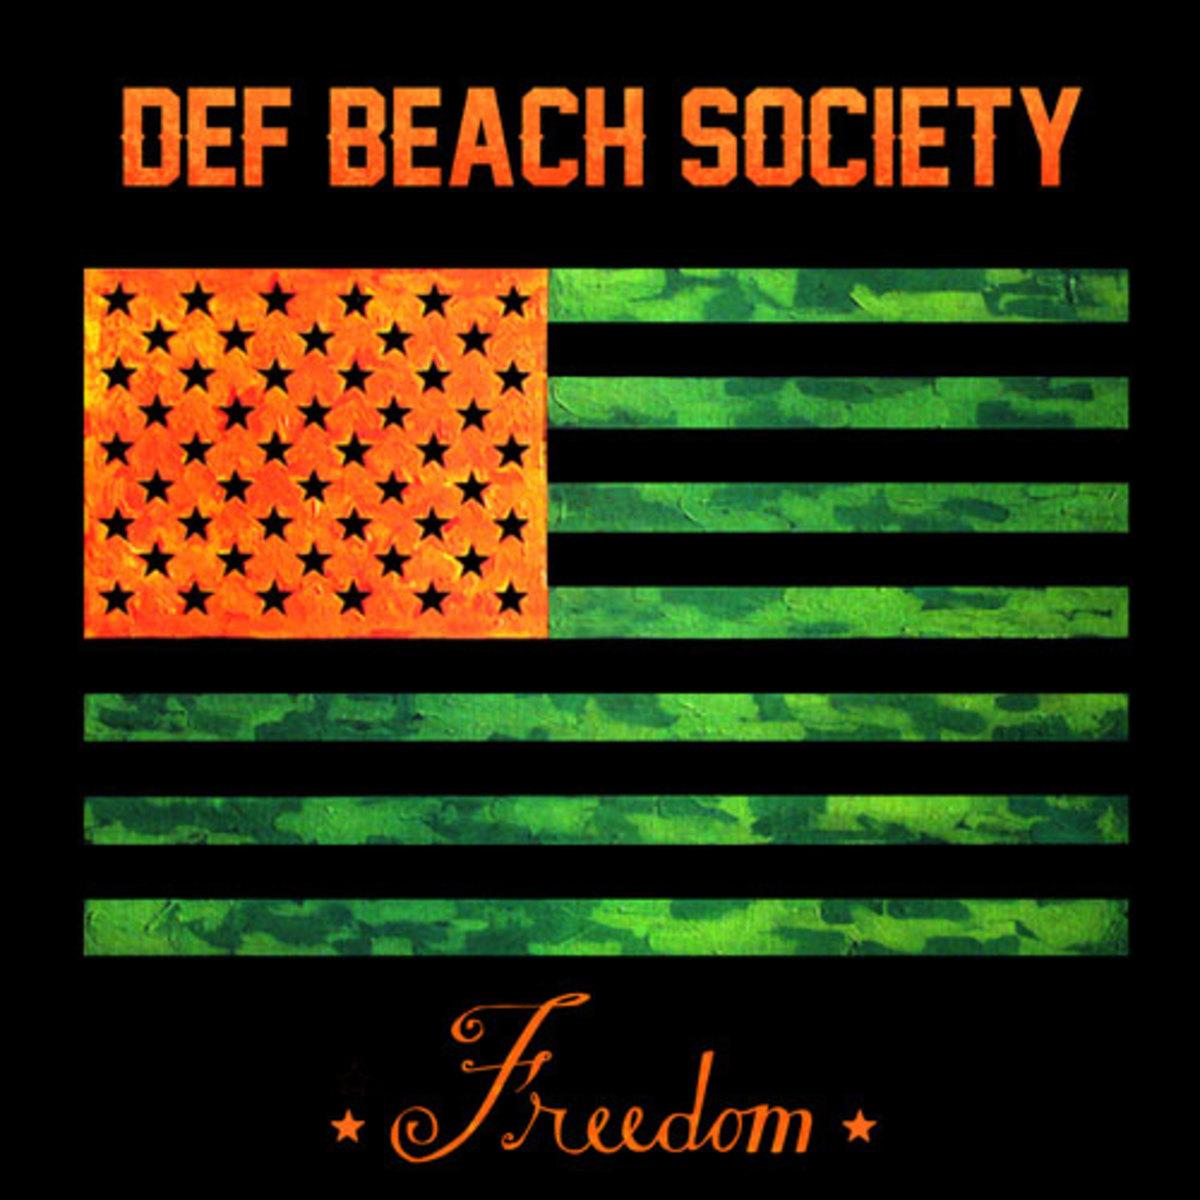 defbeachsociety-freedom.jpg